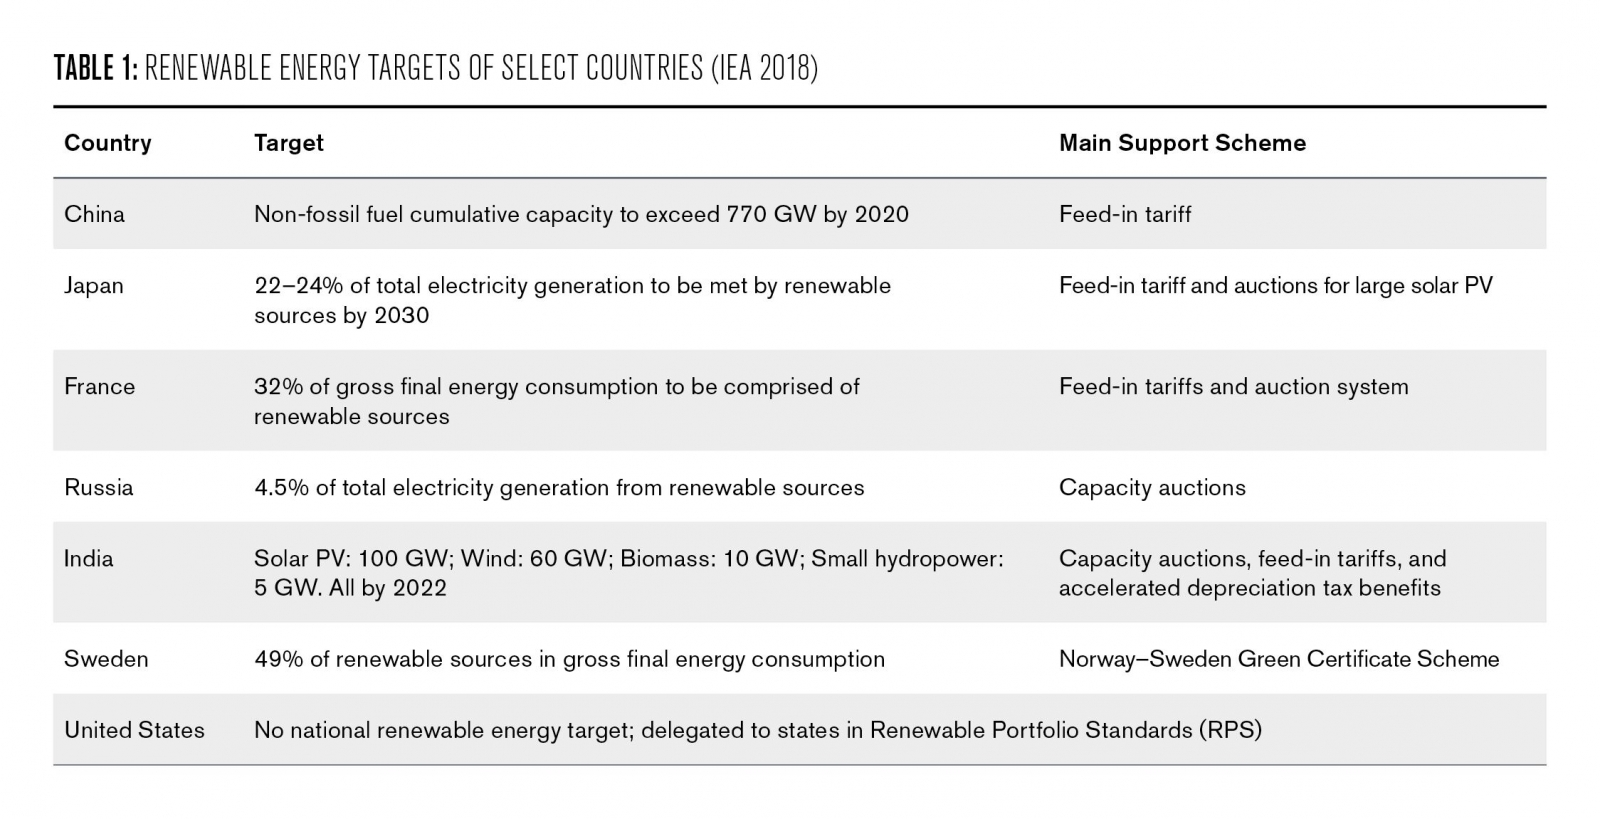 Table 1: Renewable energy targets of select countries (IEA 2018)